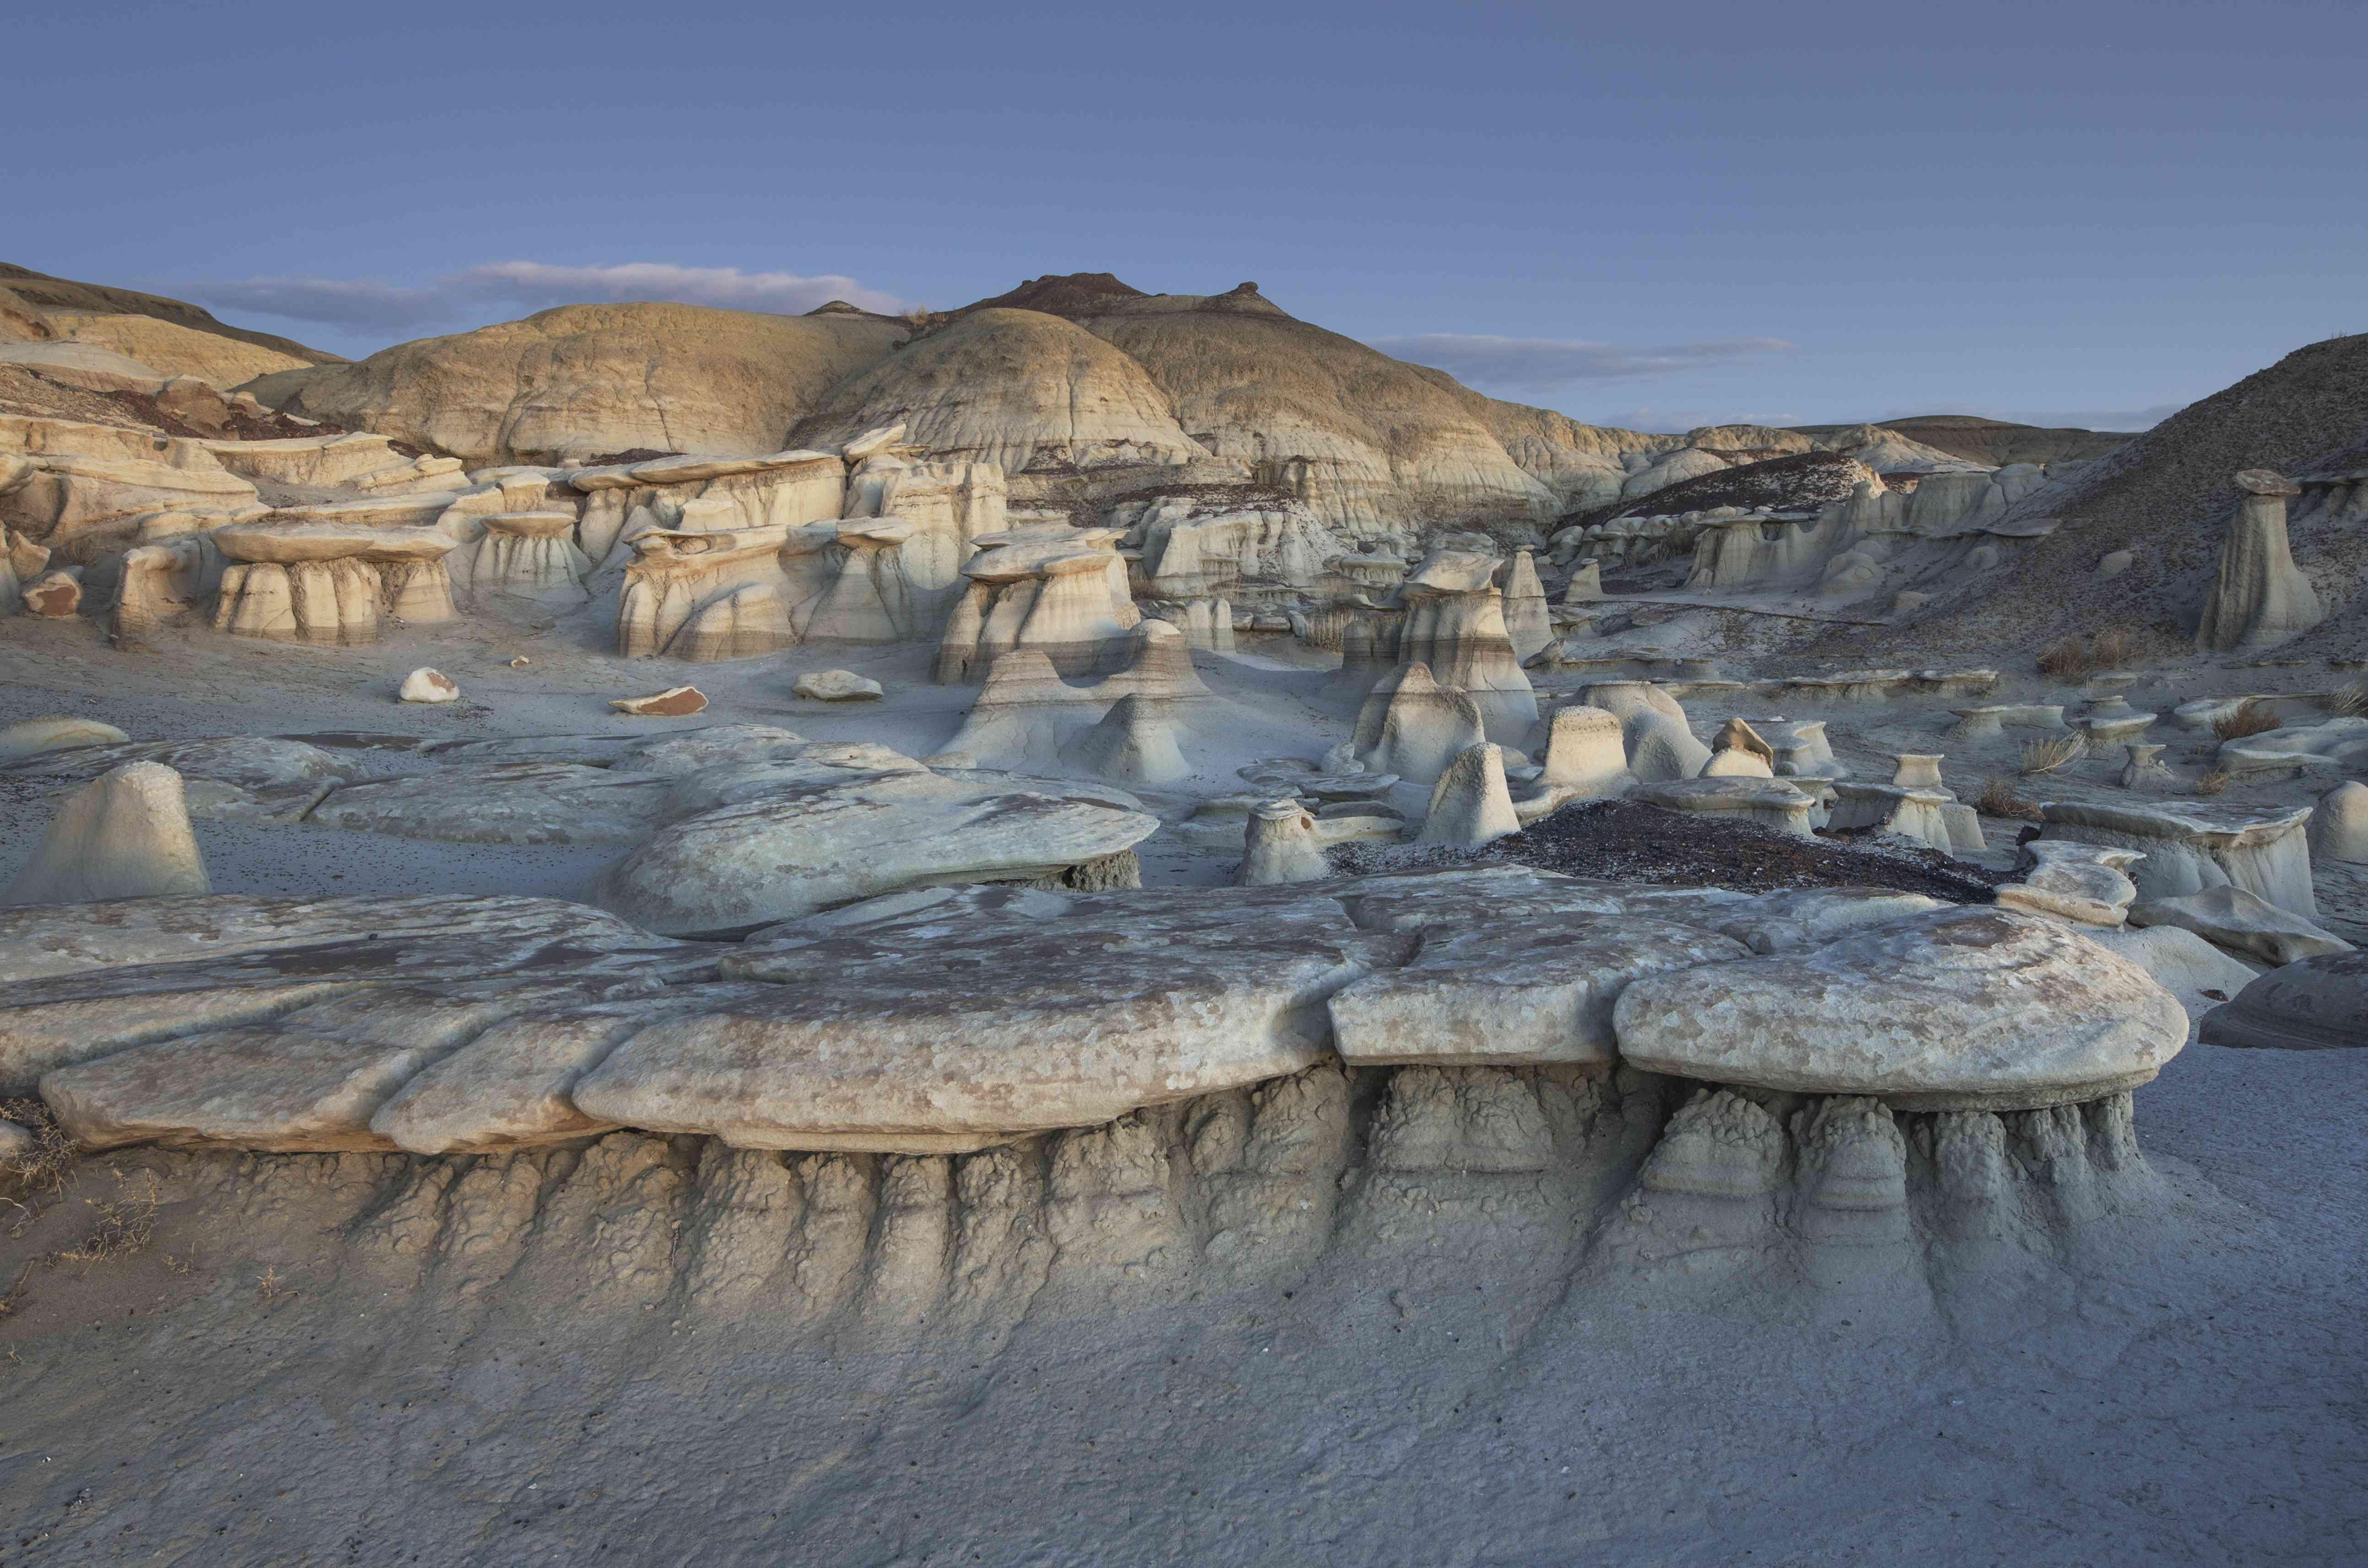 Hoodoos scattered across the desert in Bisti Badlands